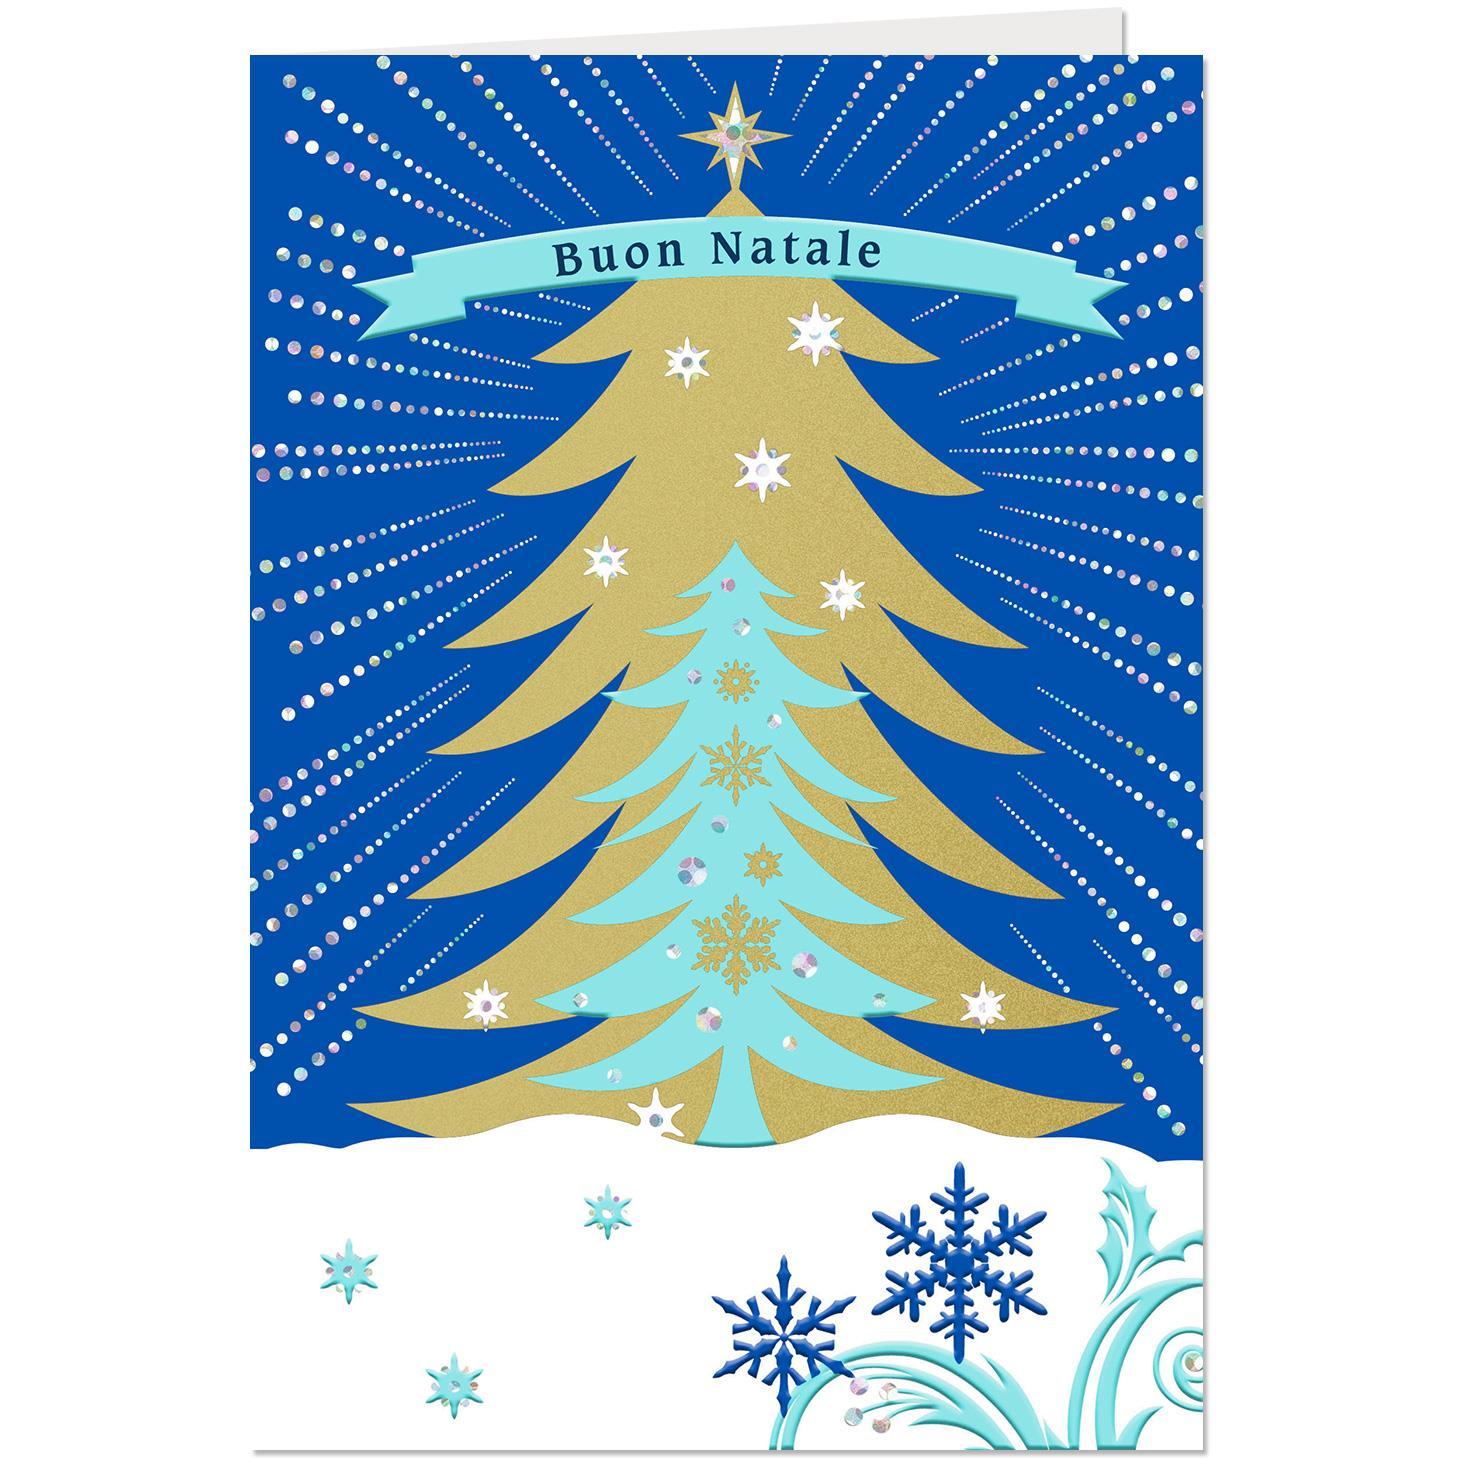 Buon natale italian language christmas card greeting cards hallmark buon natale italian language christmas card m4hsunfo